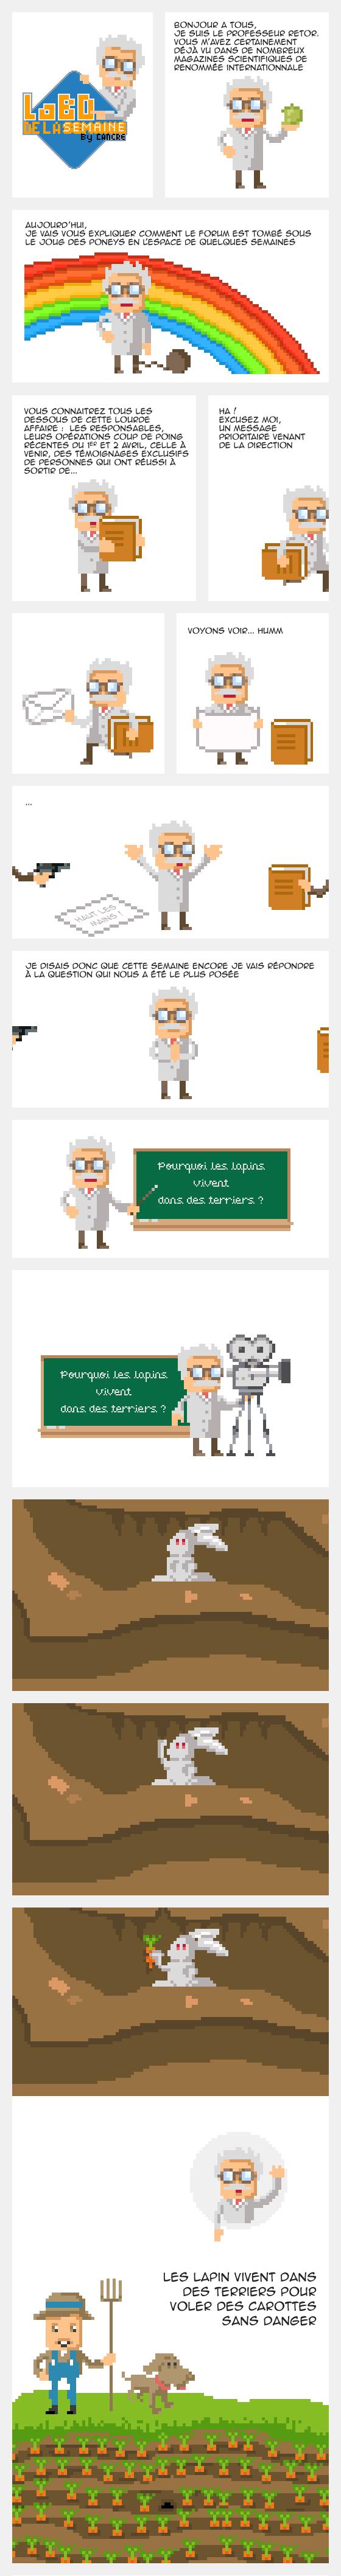 professeur_retor-2.png